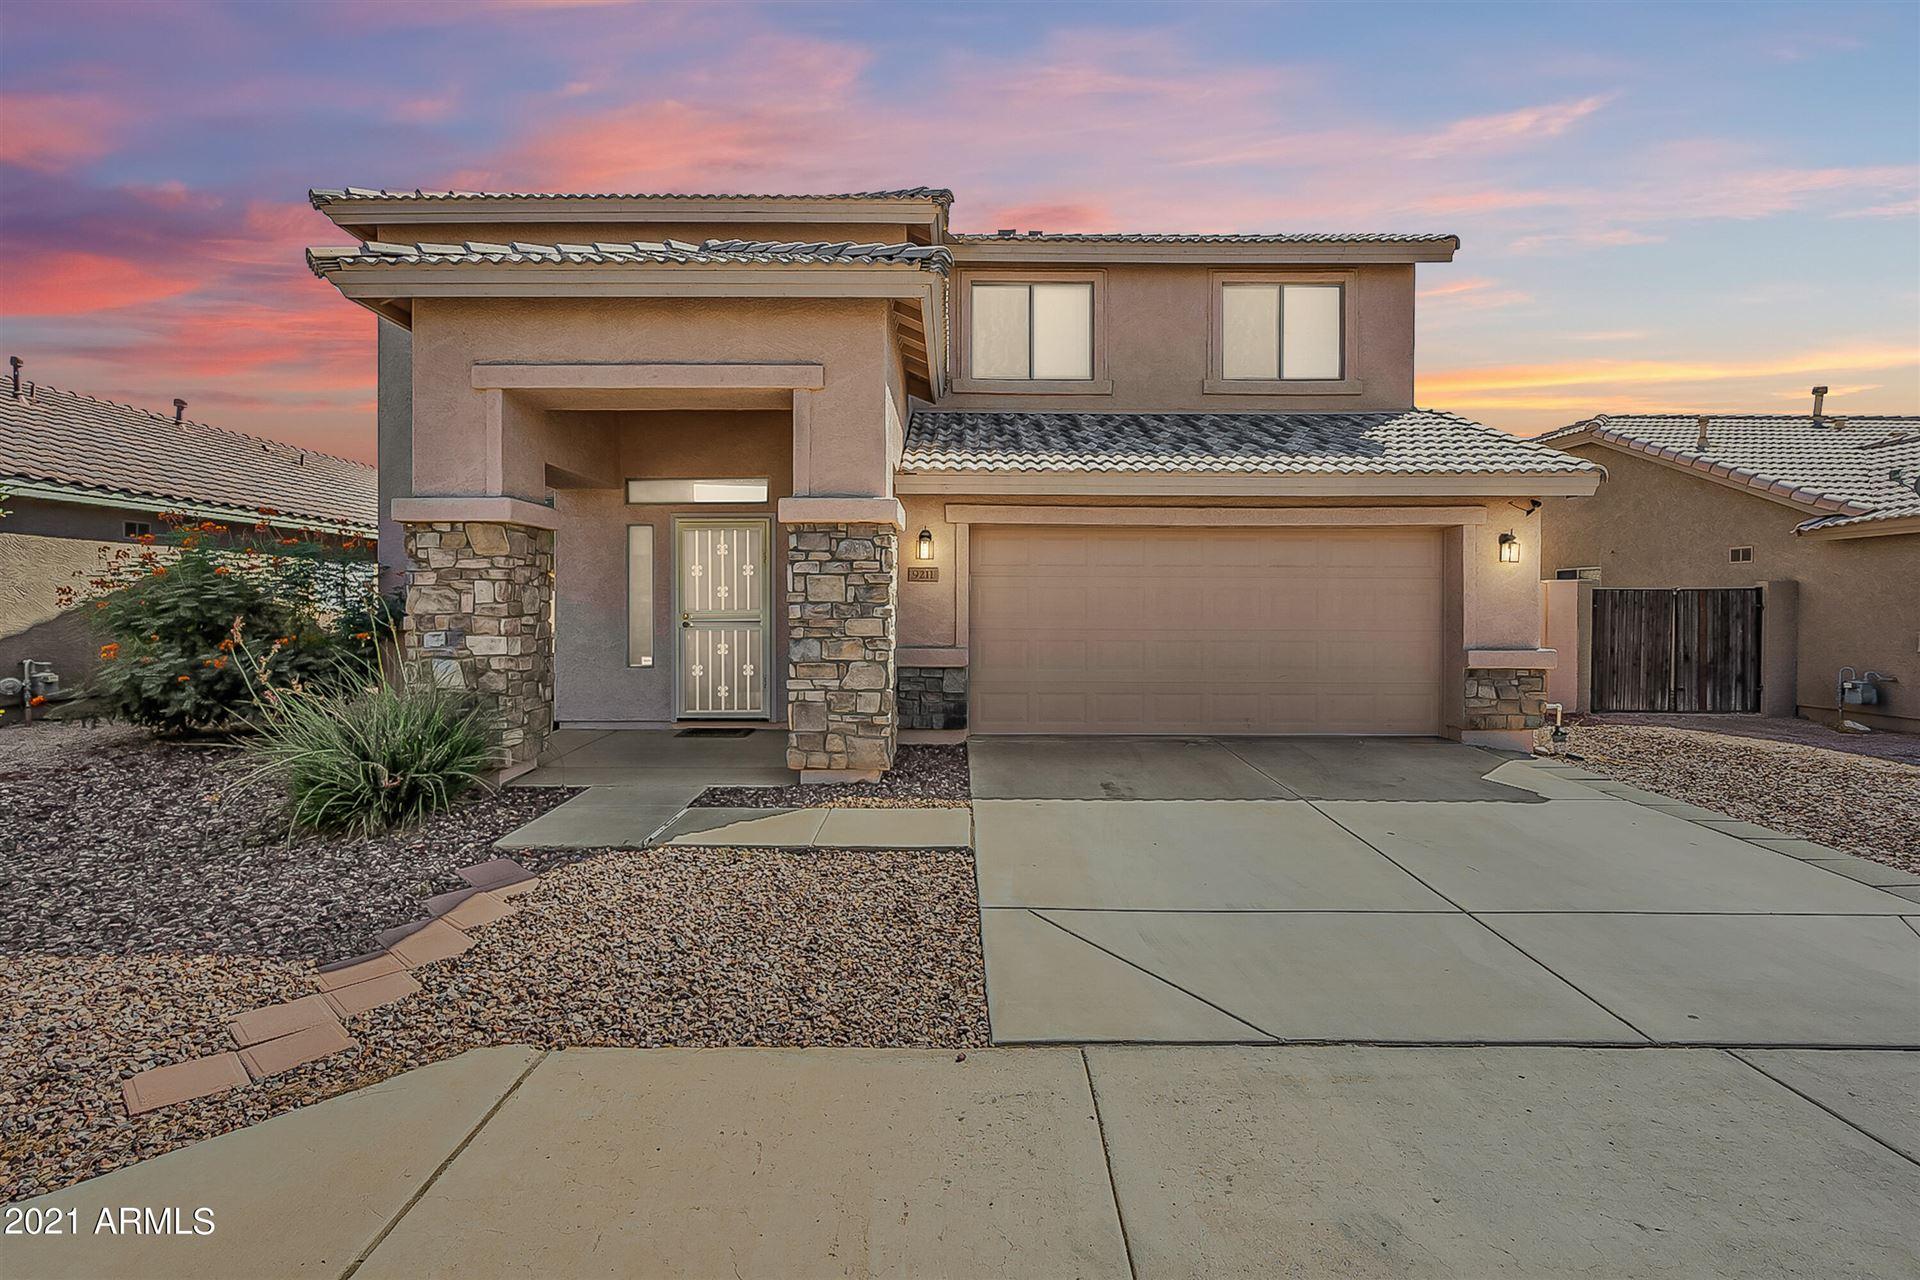 9211 W HAZELWOOD Street, Phoenix, AZ 85037 - MLS#: 6298426